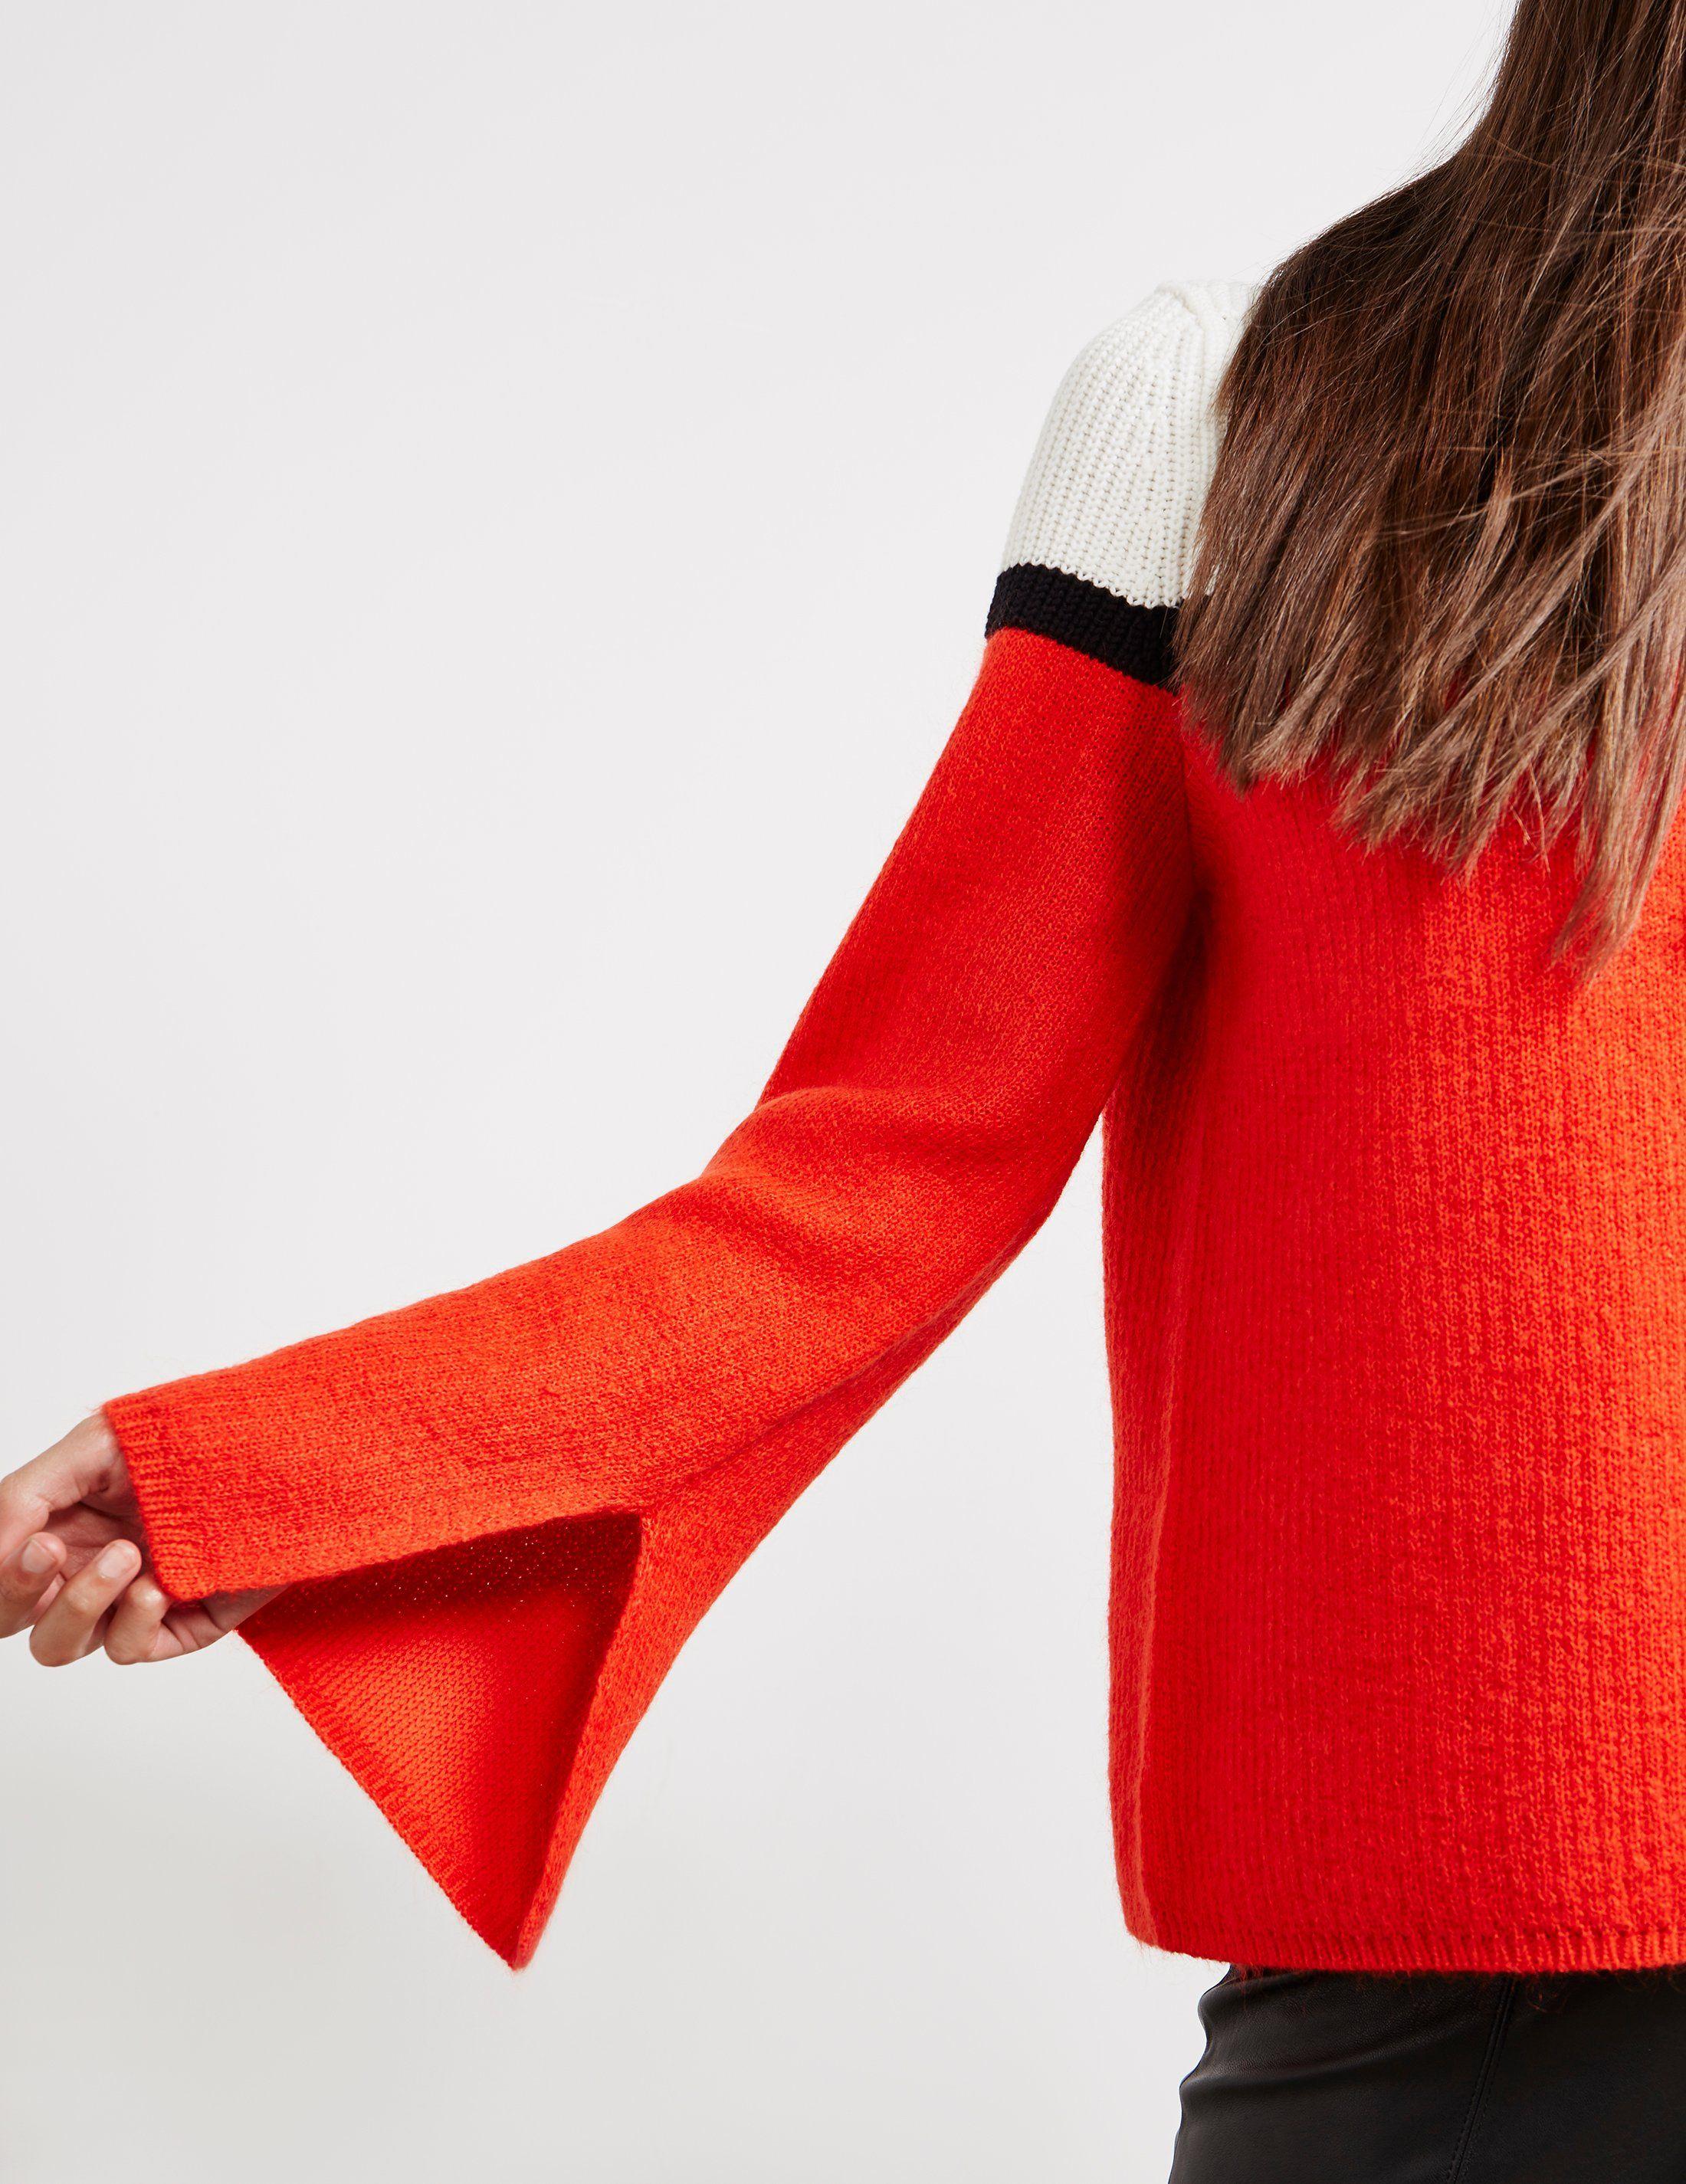 BOSS Issa Oversized Knit Jumper - Online Exclusive